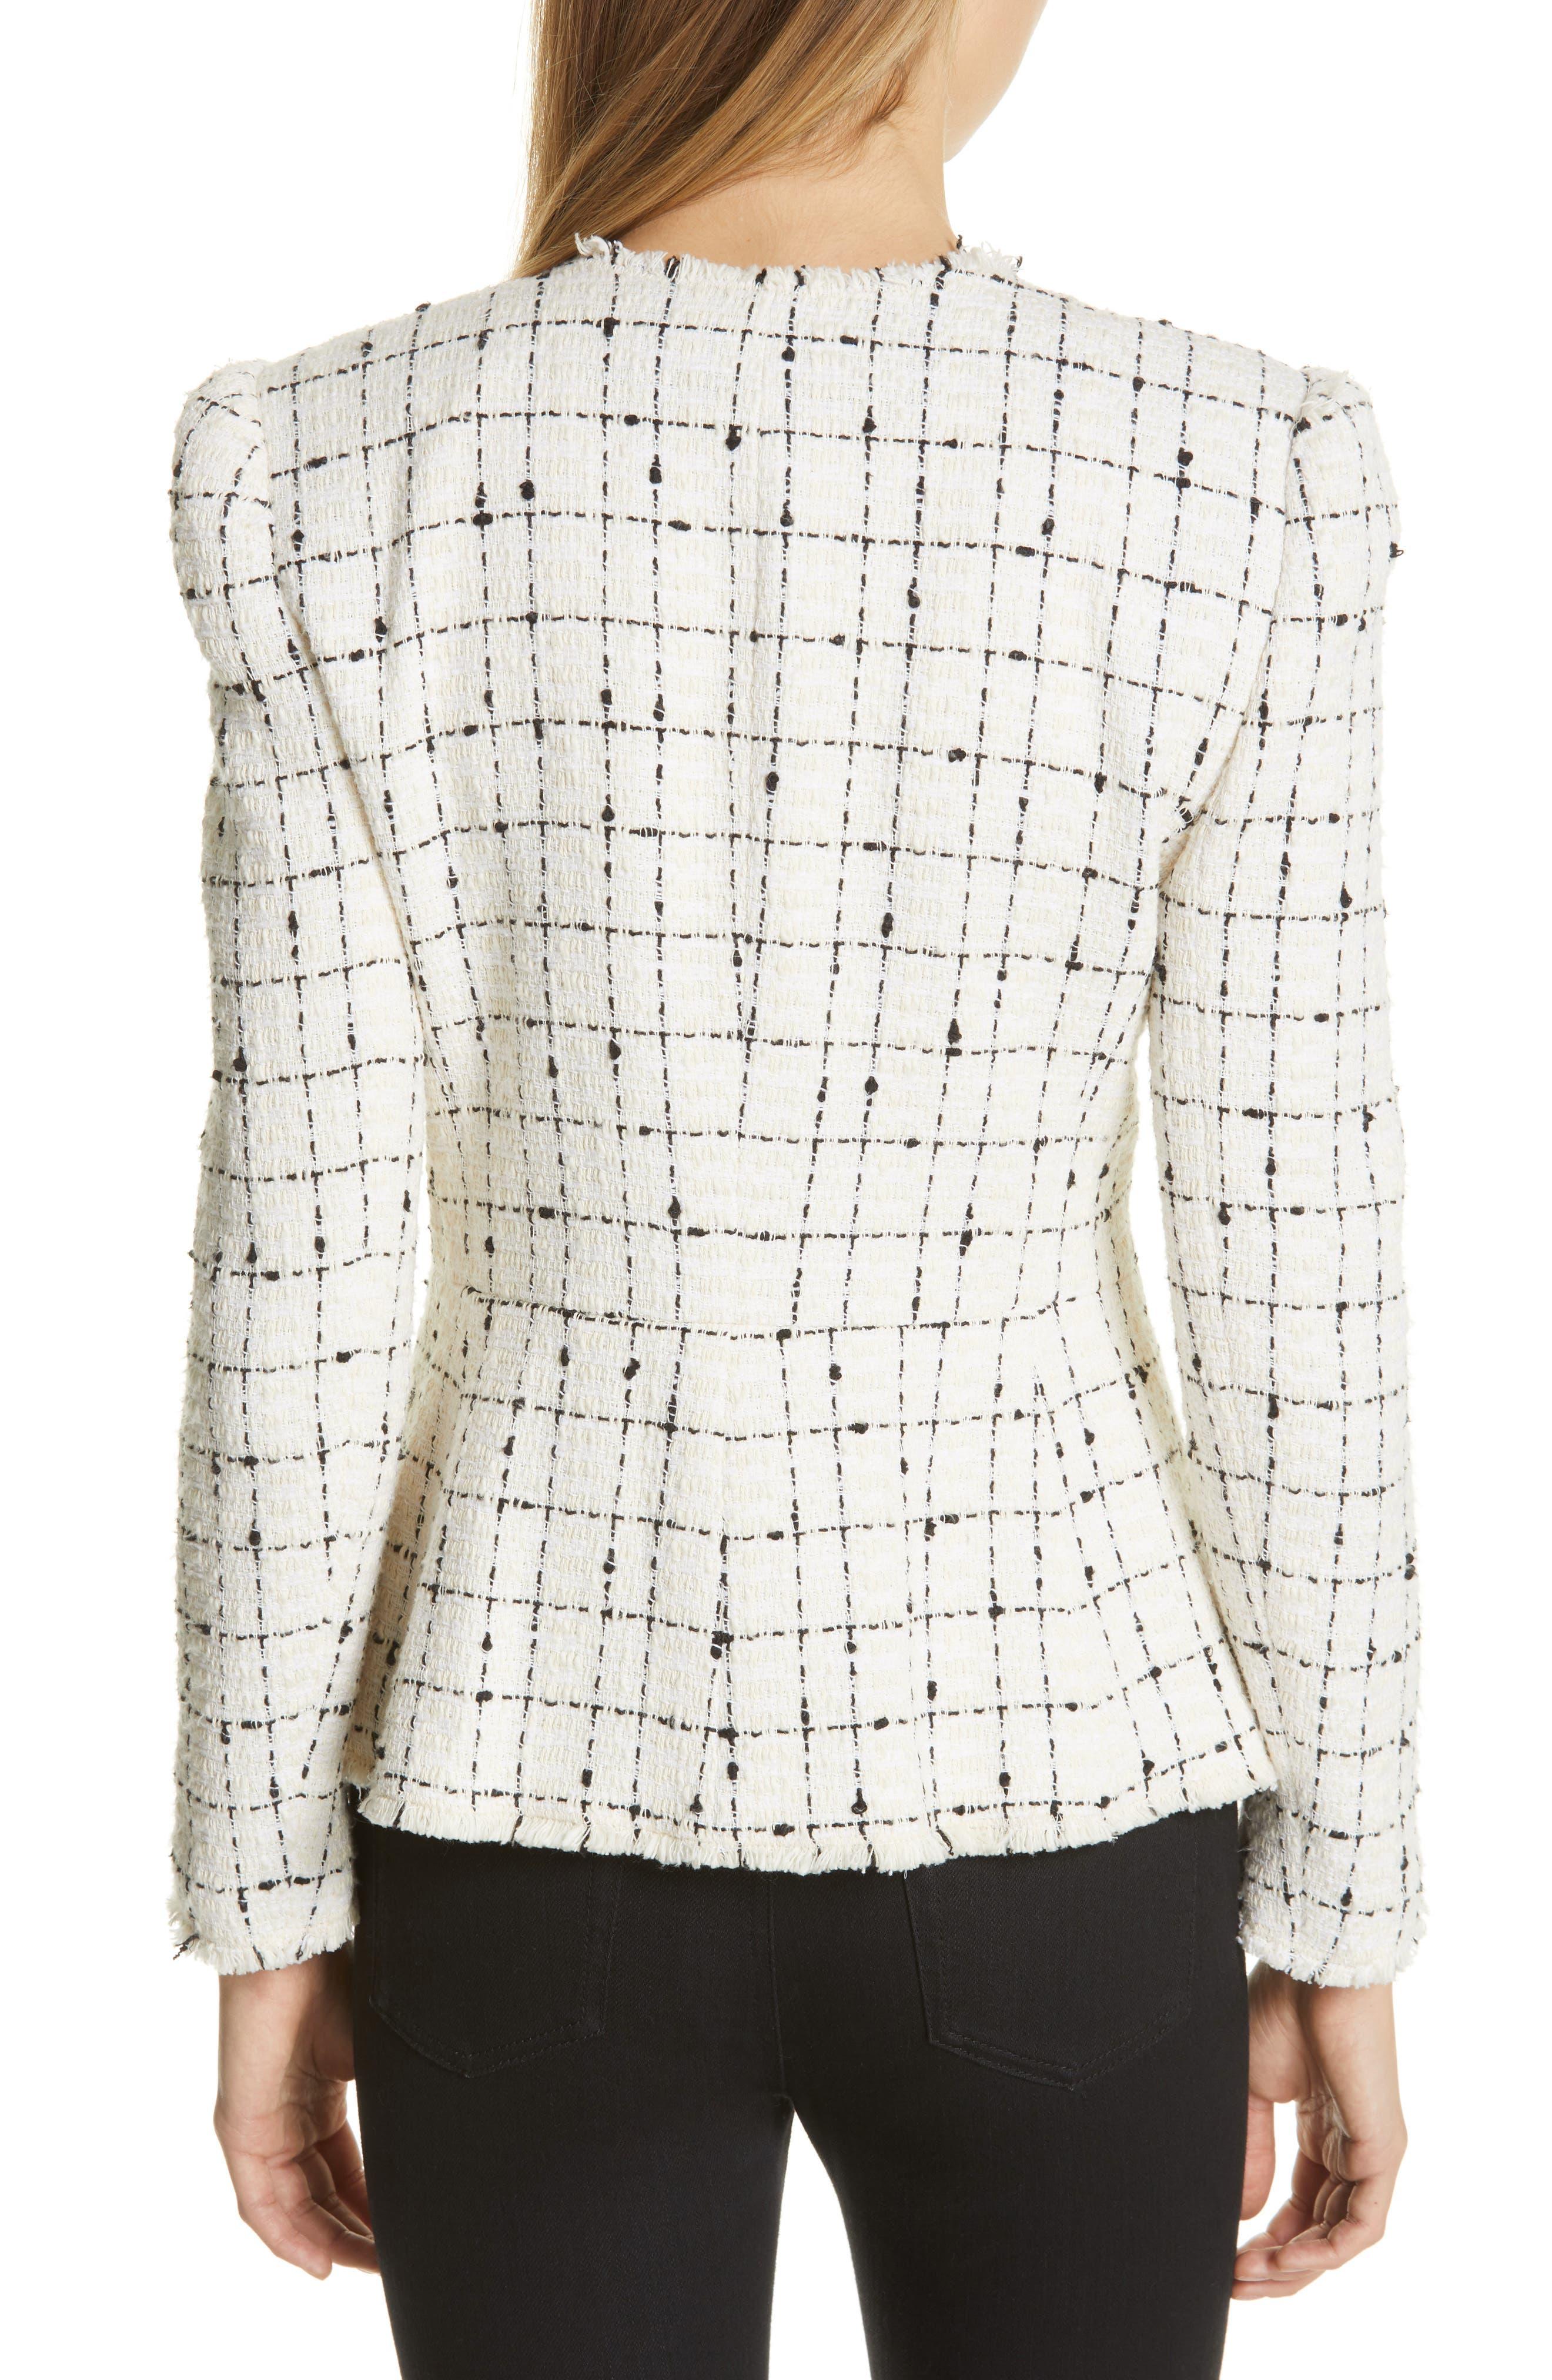 REBECCA TAYLOR, Plaid Tweed Zip Jacket, Alternate thumbnail 2, color, CREAM COMBO